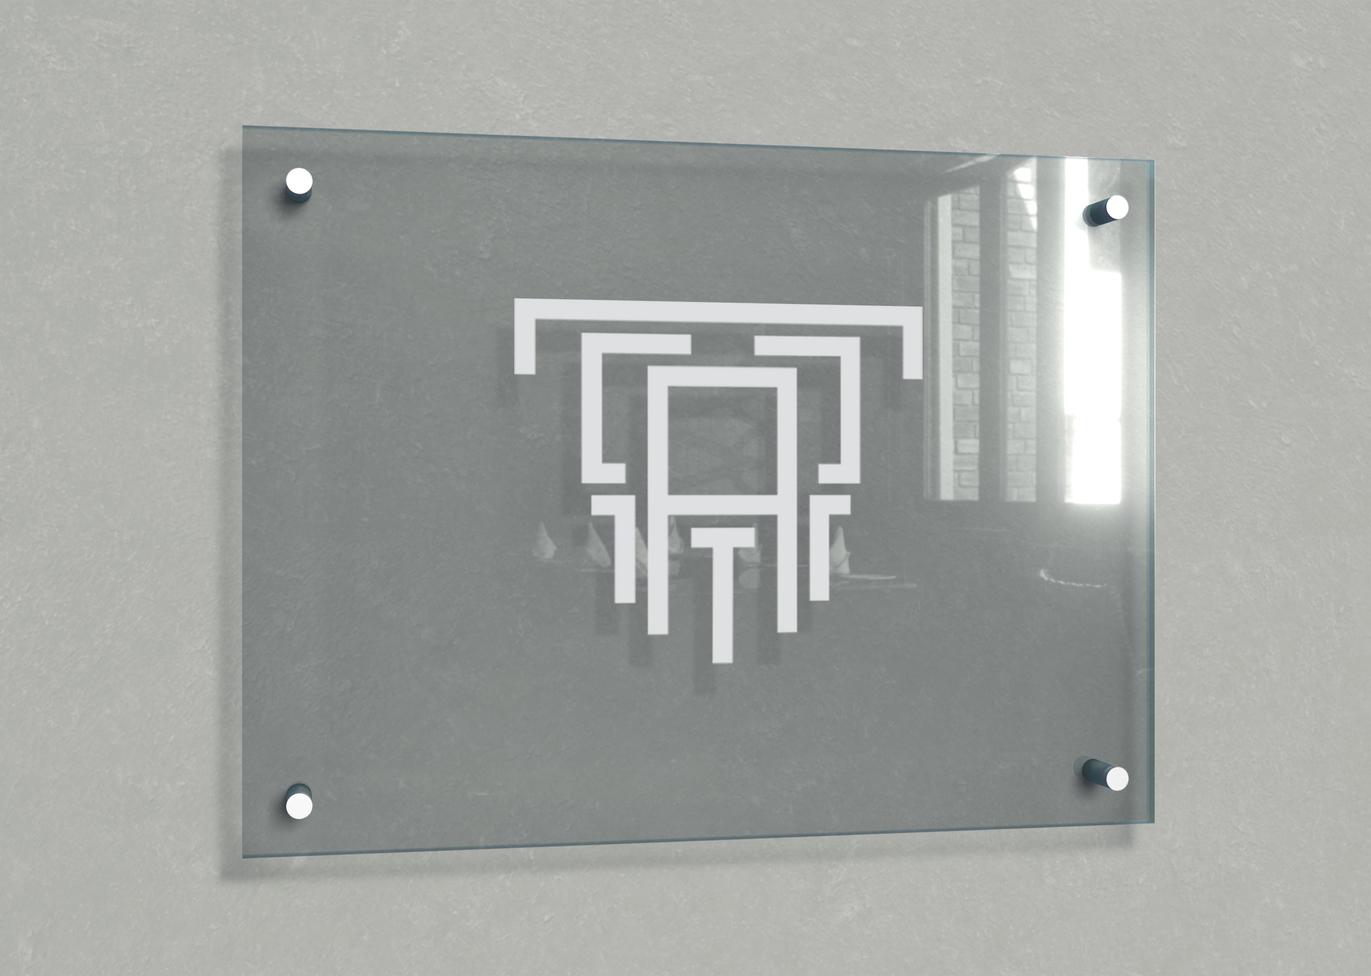 Разработка логотипа стоматологического медицинского центра фото f_3185e48151f5e816.jpg